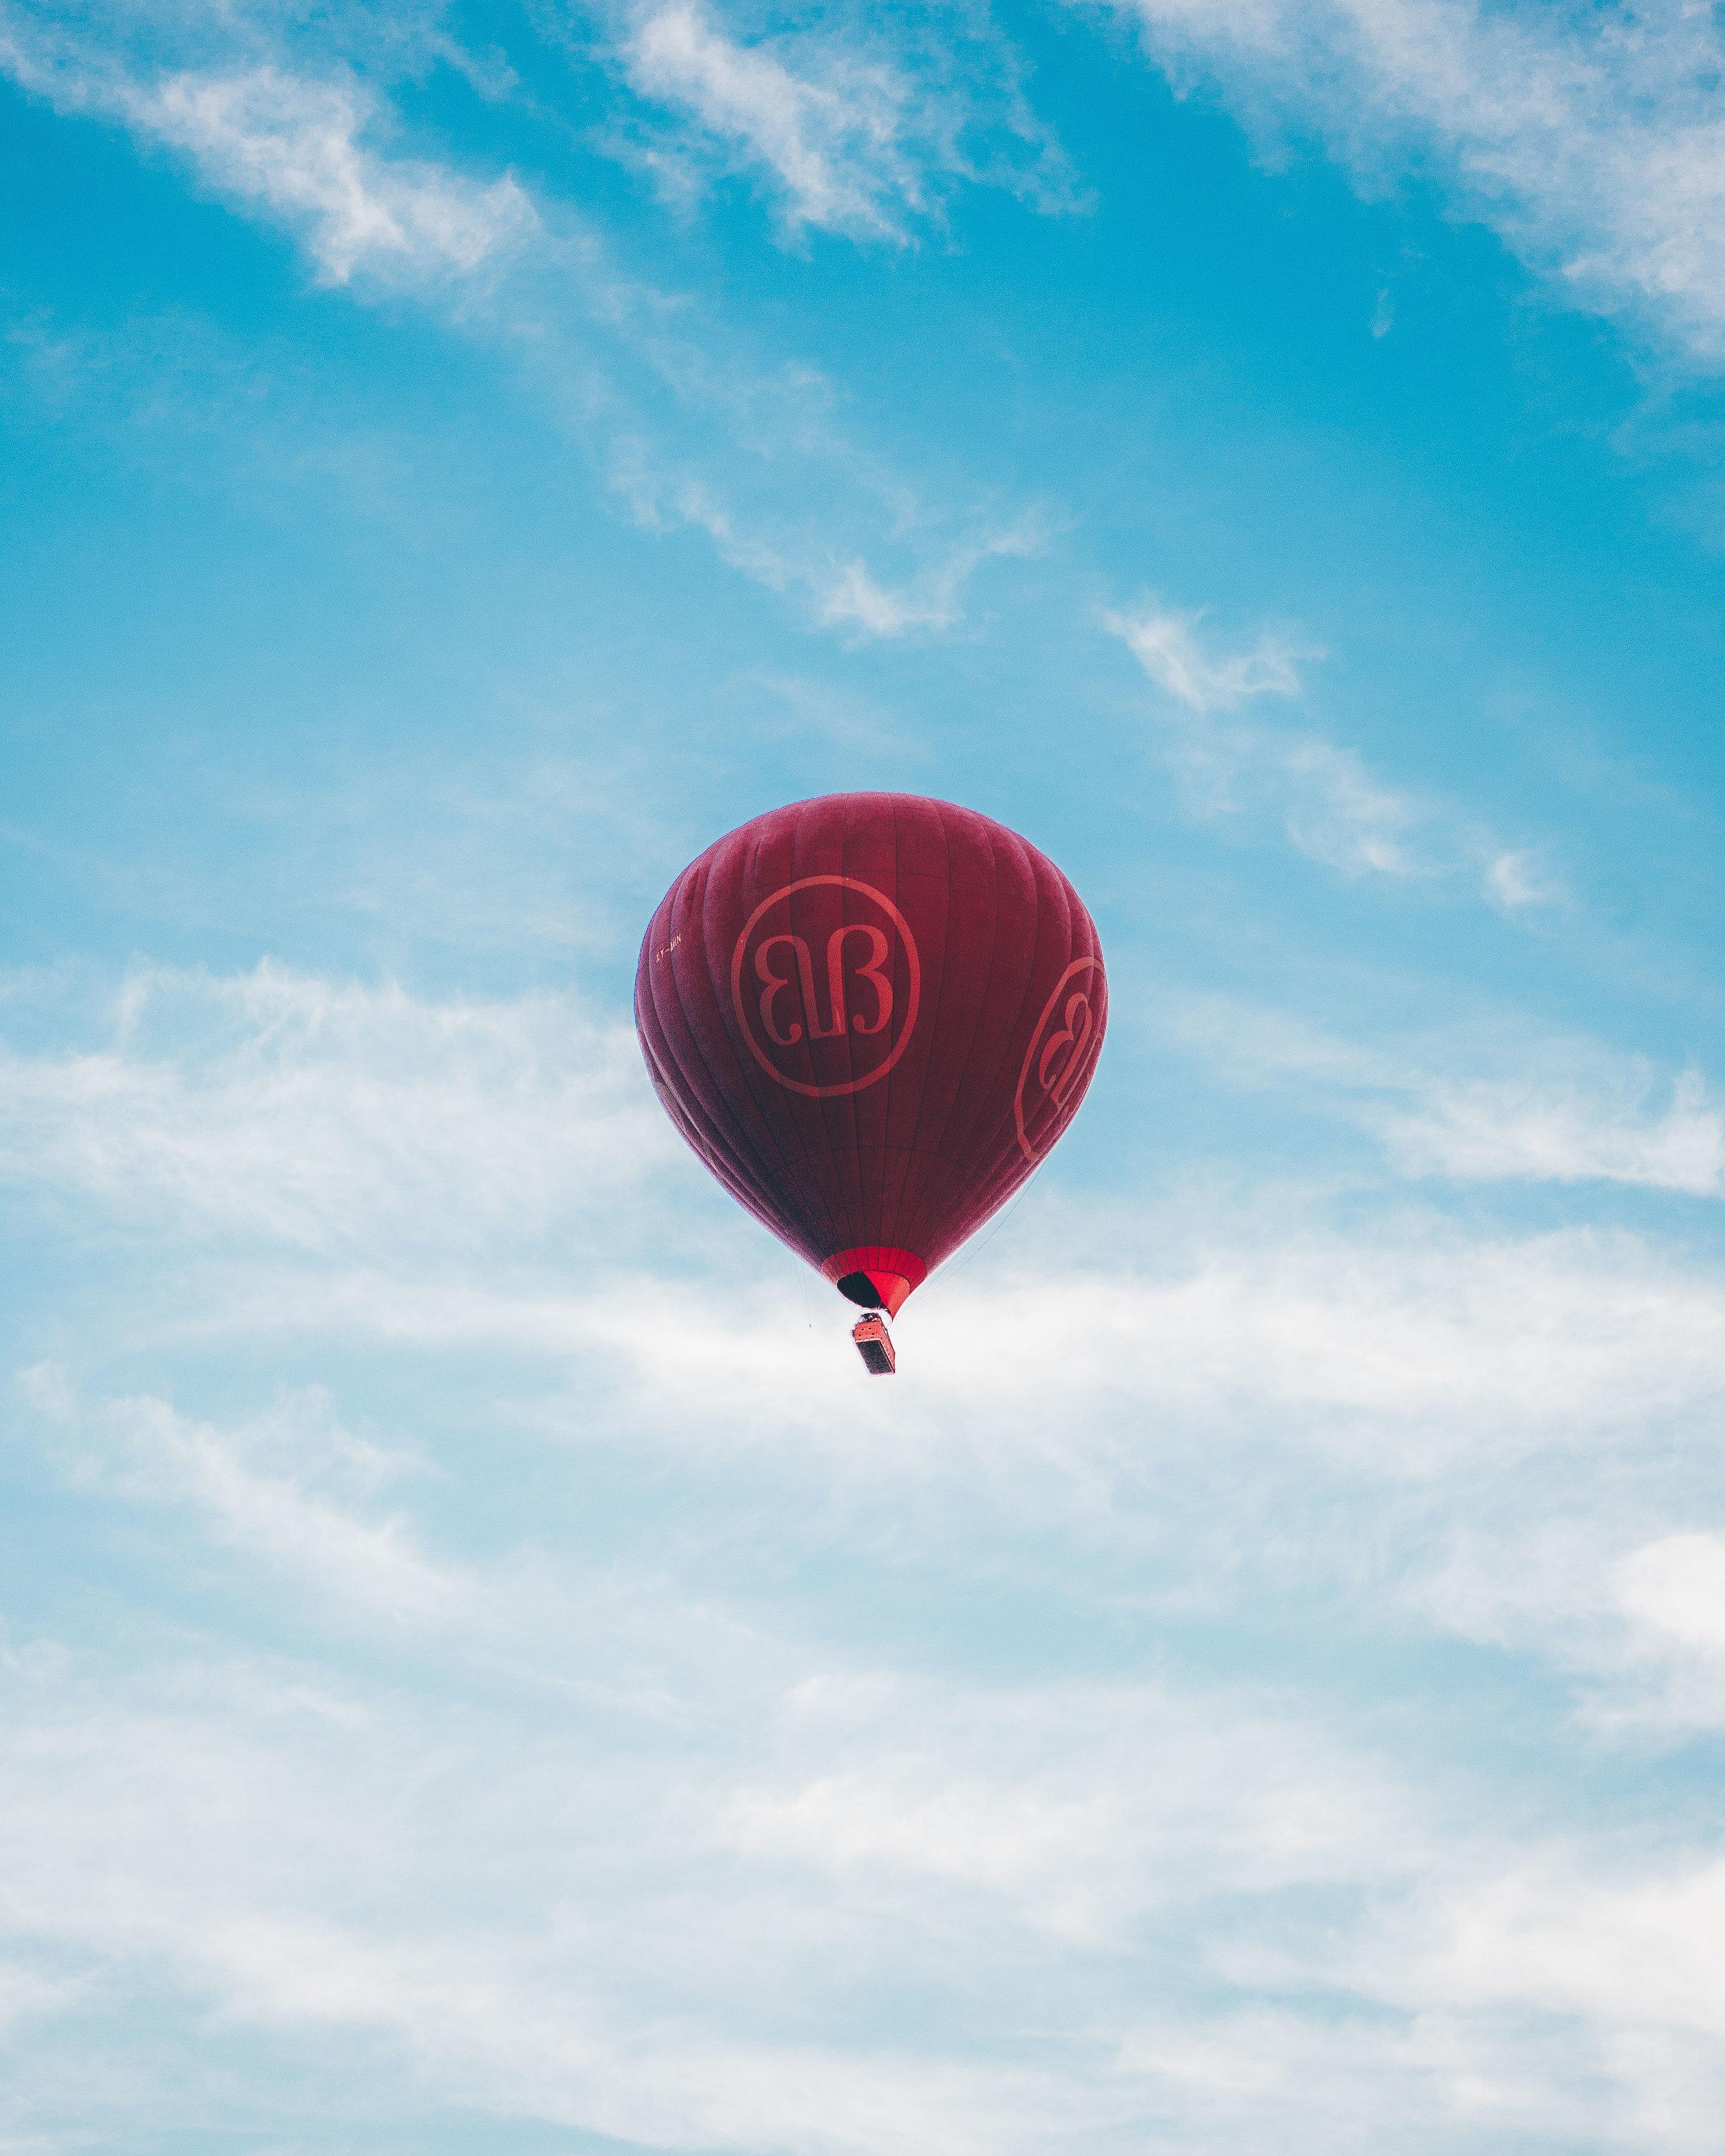 Balloon at Bagan Resized-0850.jpg